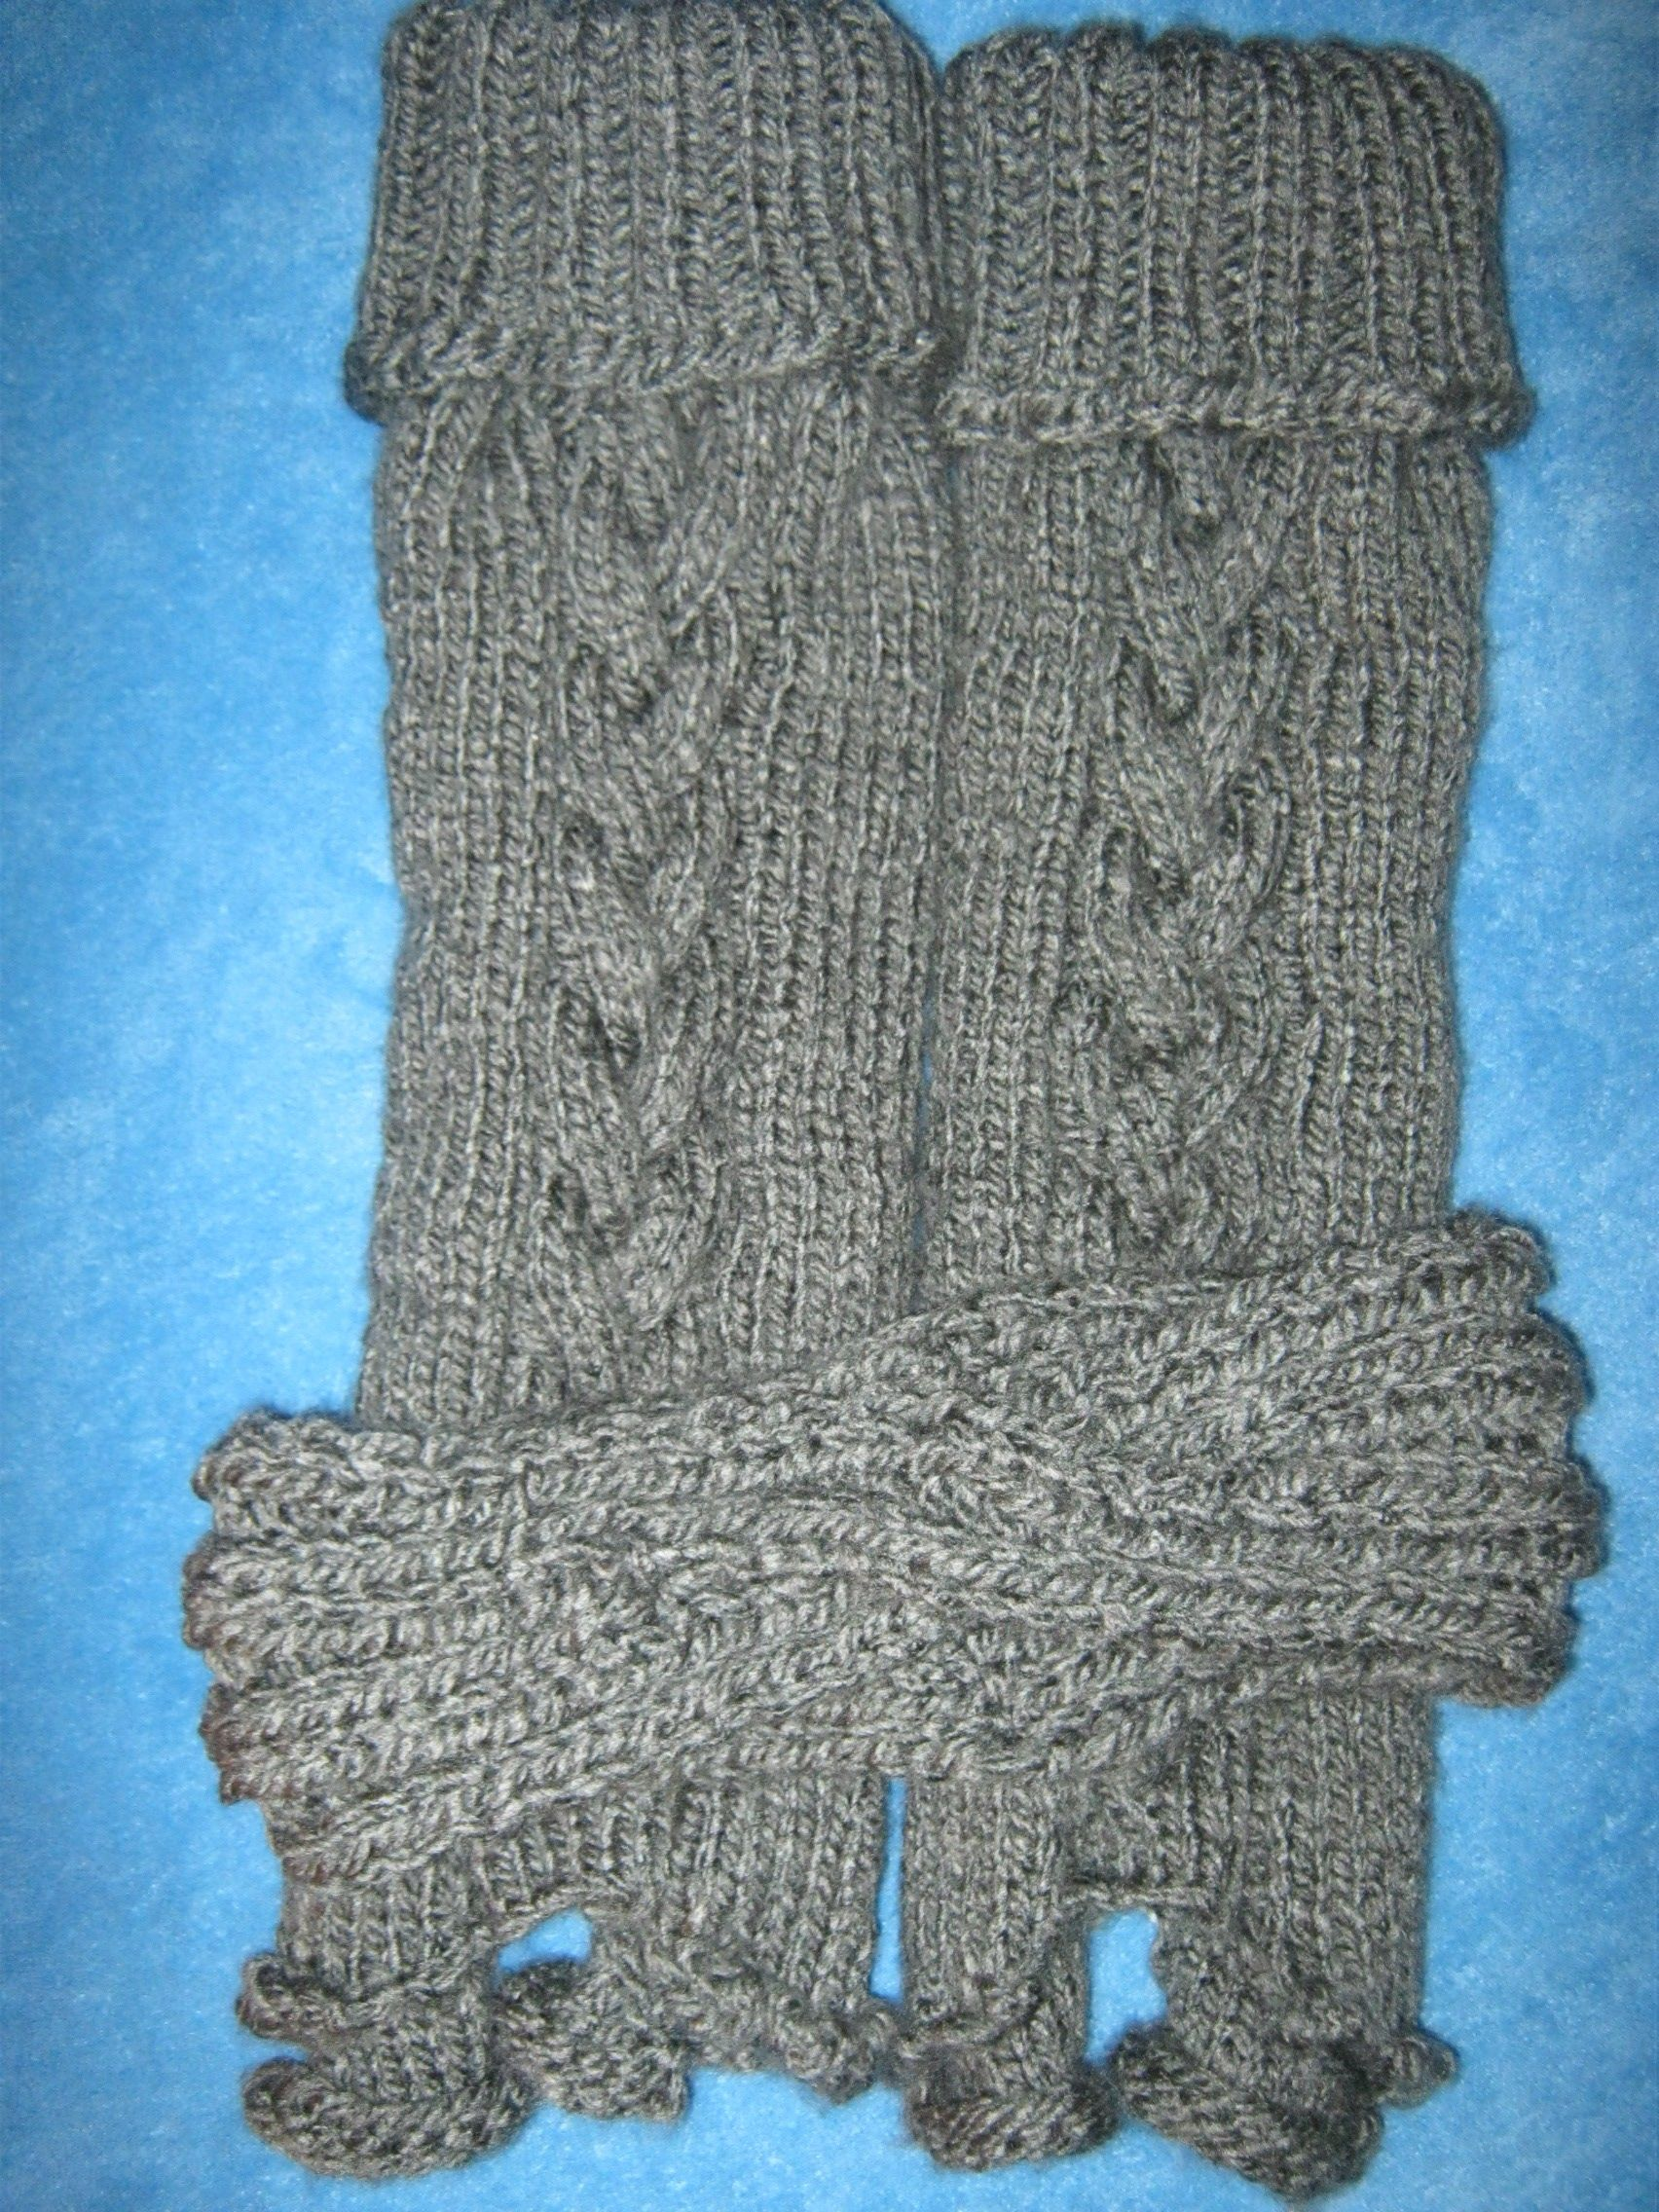 Legwarmers and headband.  Matching fingerless gloves not shown.